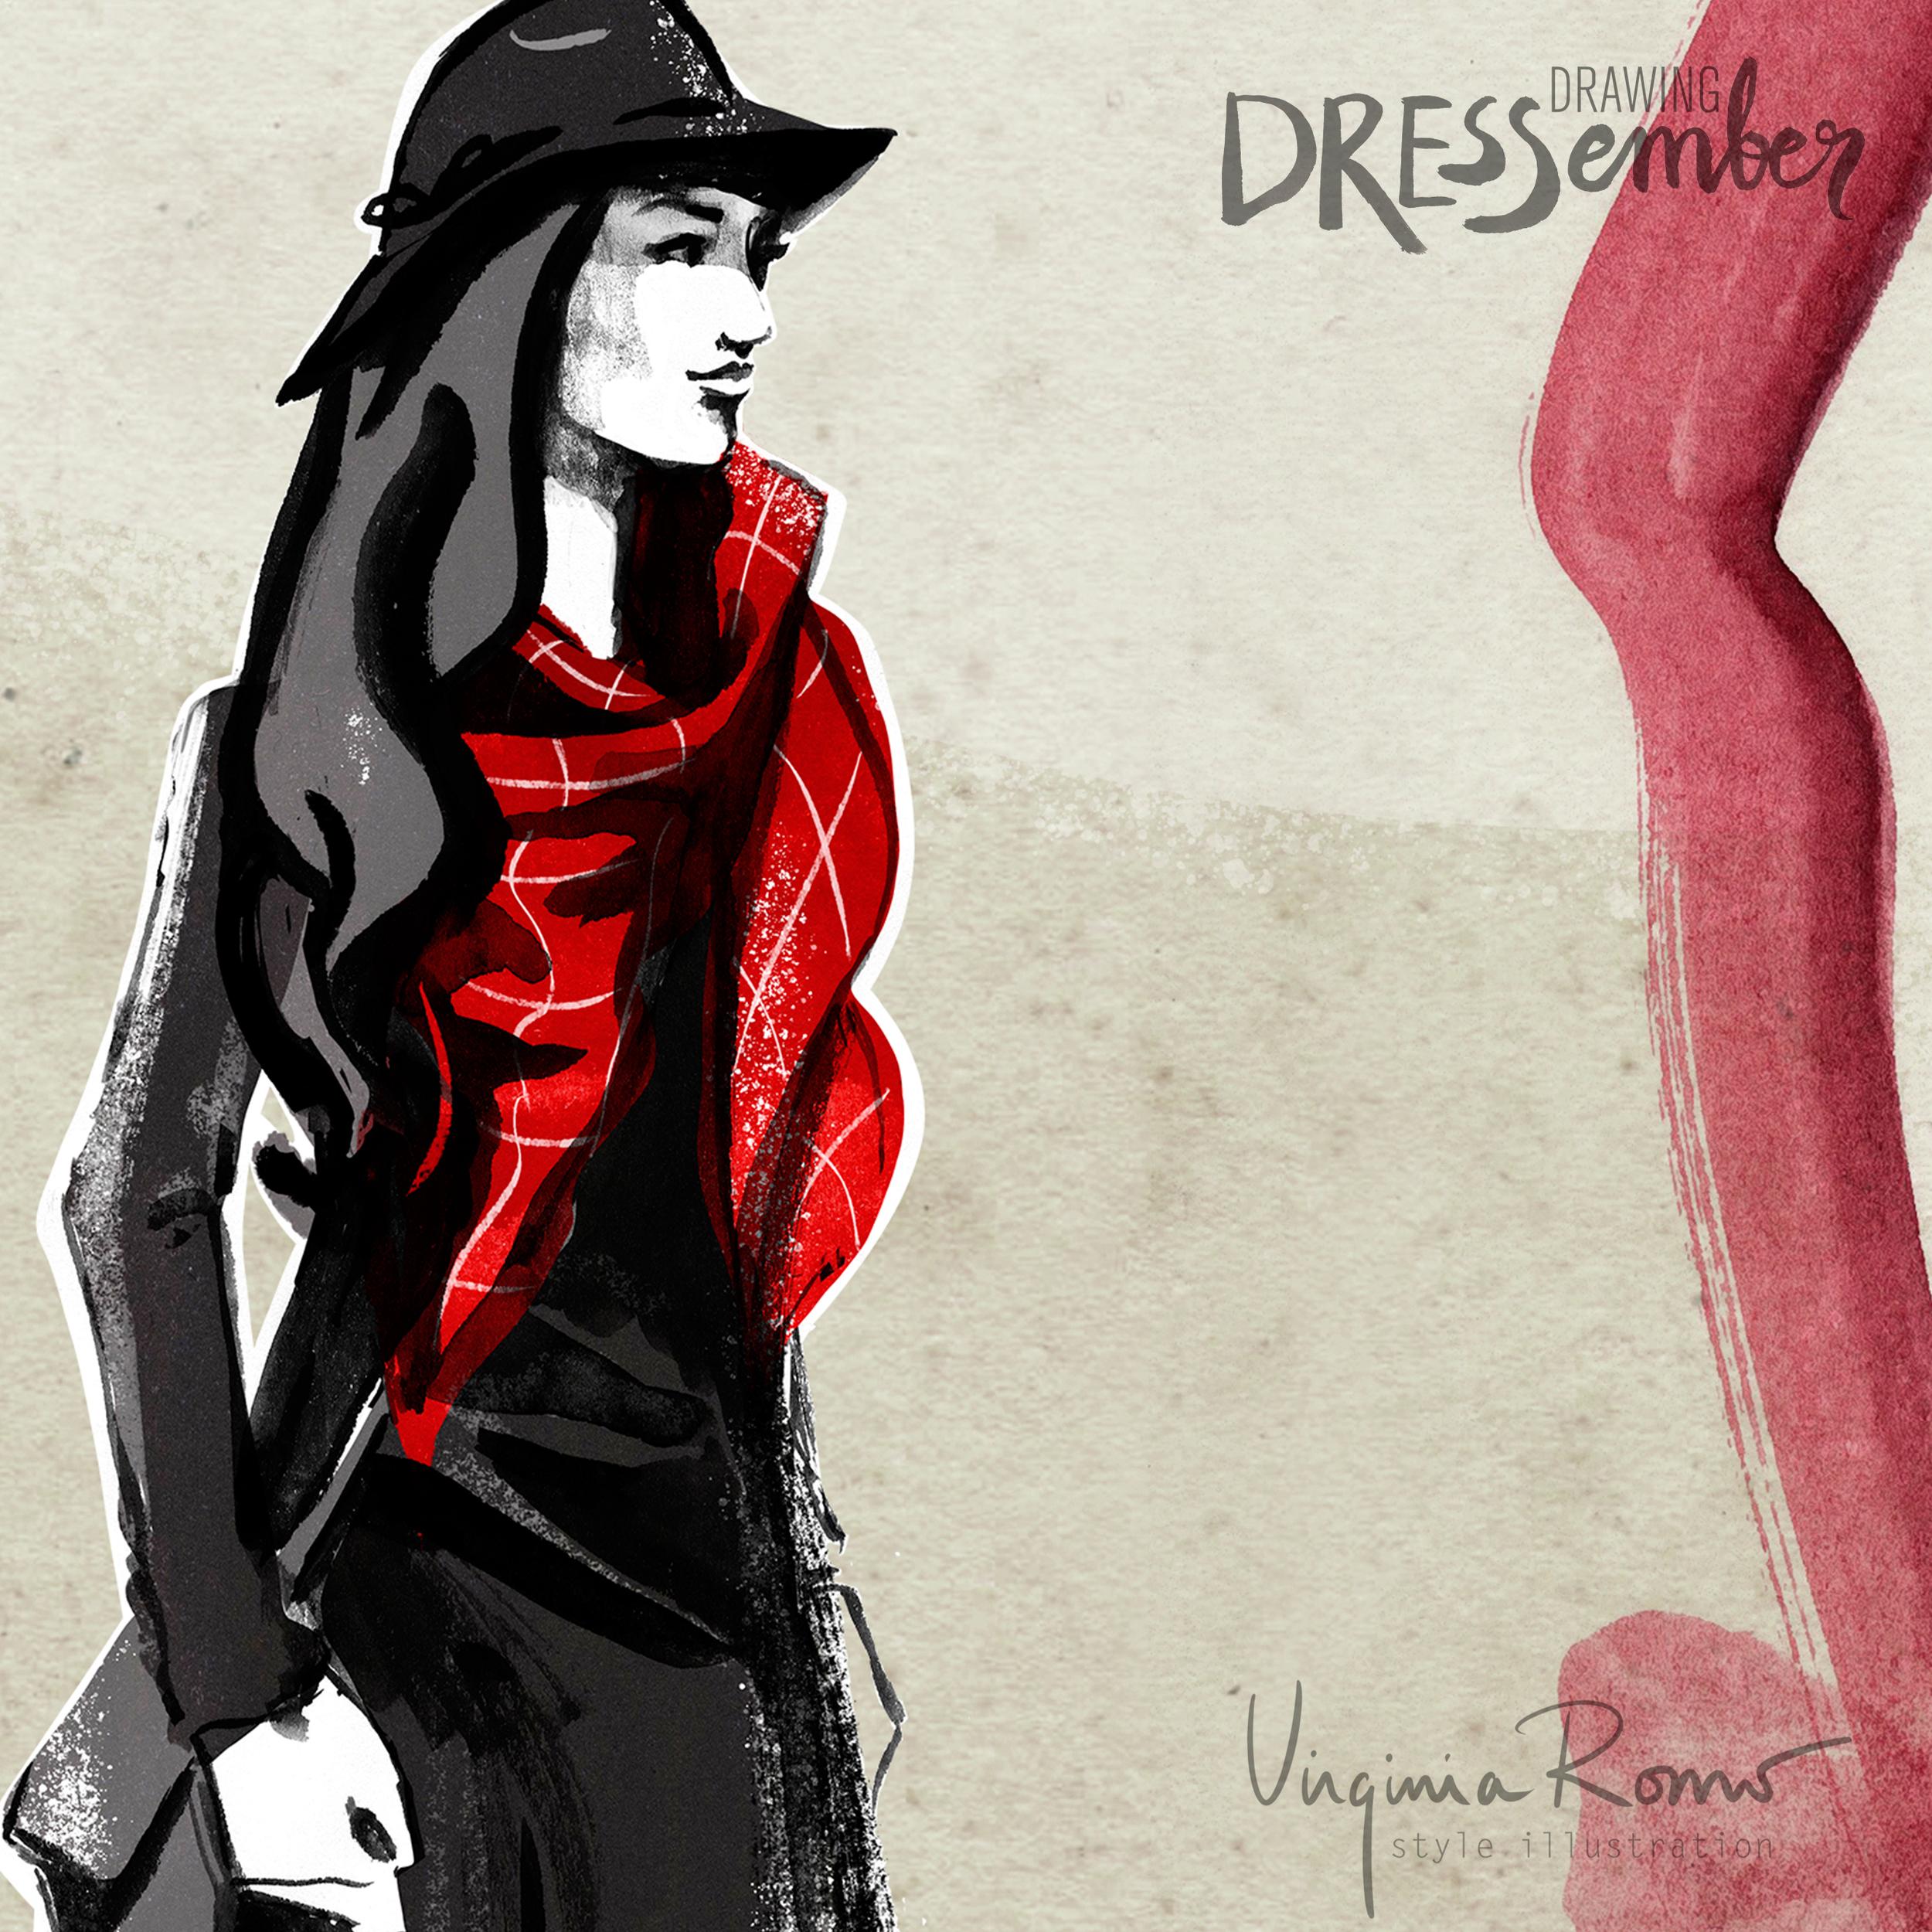 dressember-VirginiaRomoIllustration-11-Brooke-IG-BIG.jpg